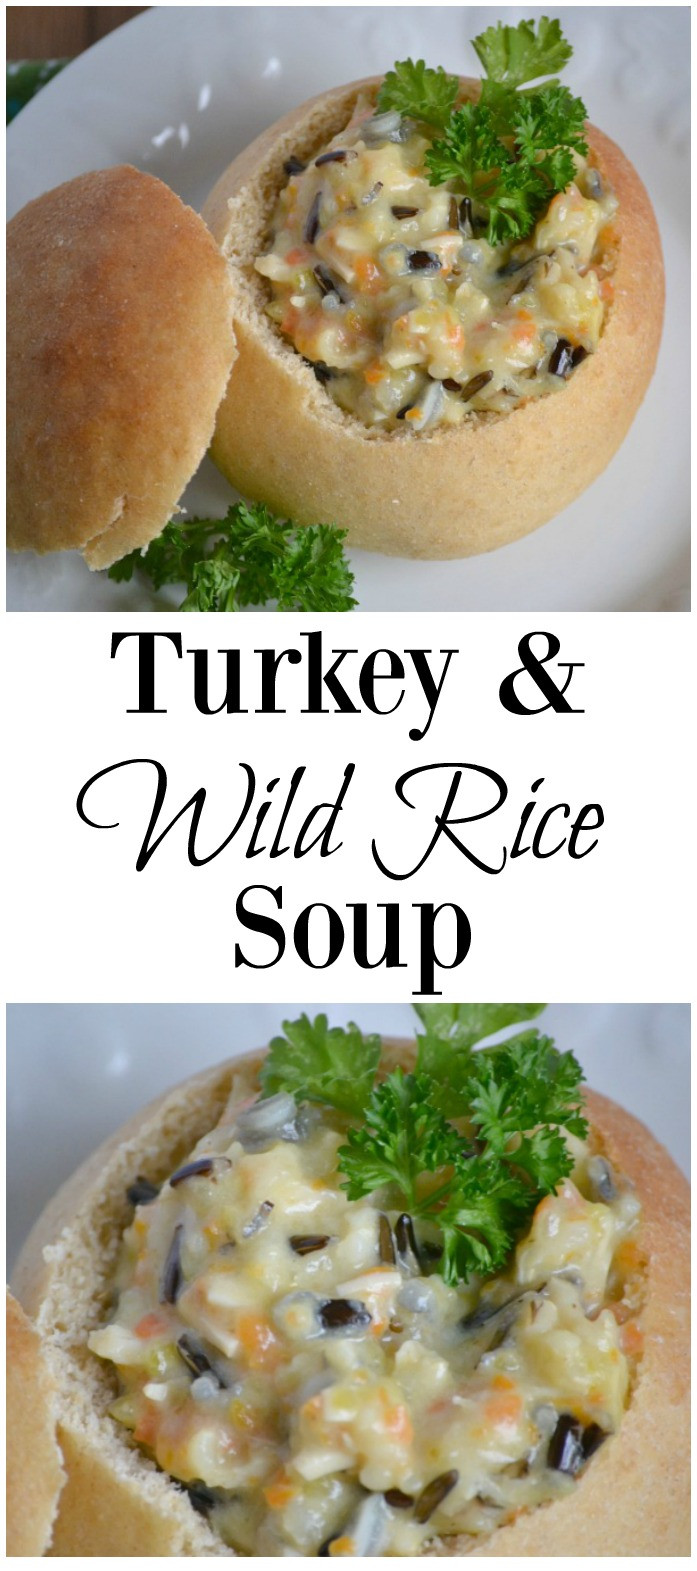 Turkey Wild Rice Soup Recipe  Turkey & Wild Rice Soup